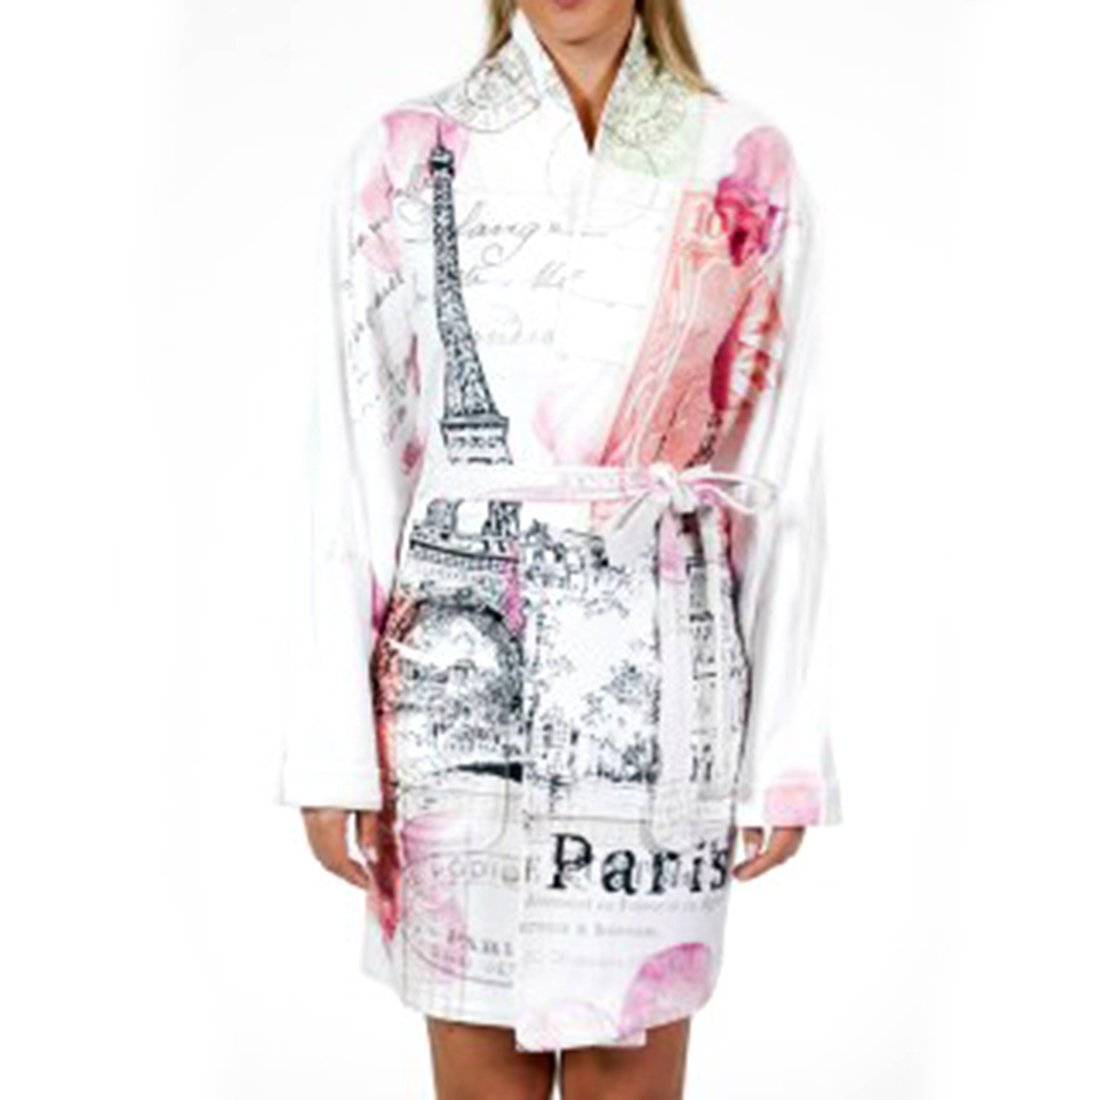 Wrap Up by VP Paris Love Note Luxury Microfiber Short Robe, S/M